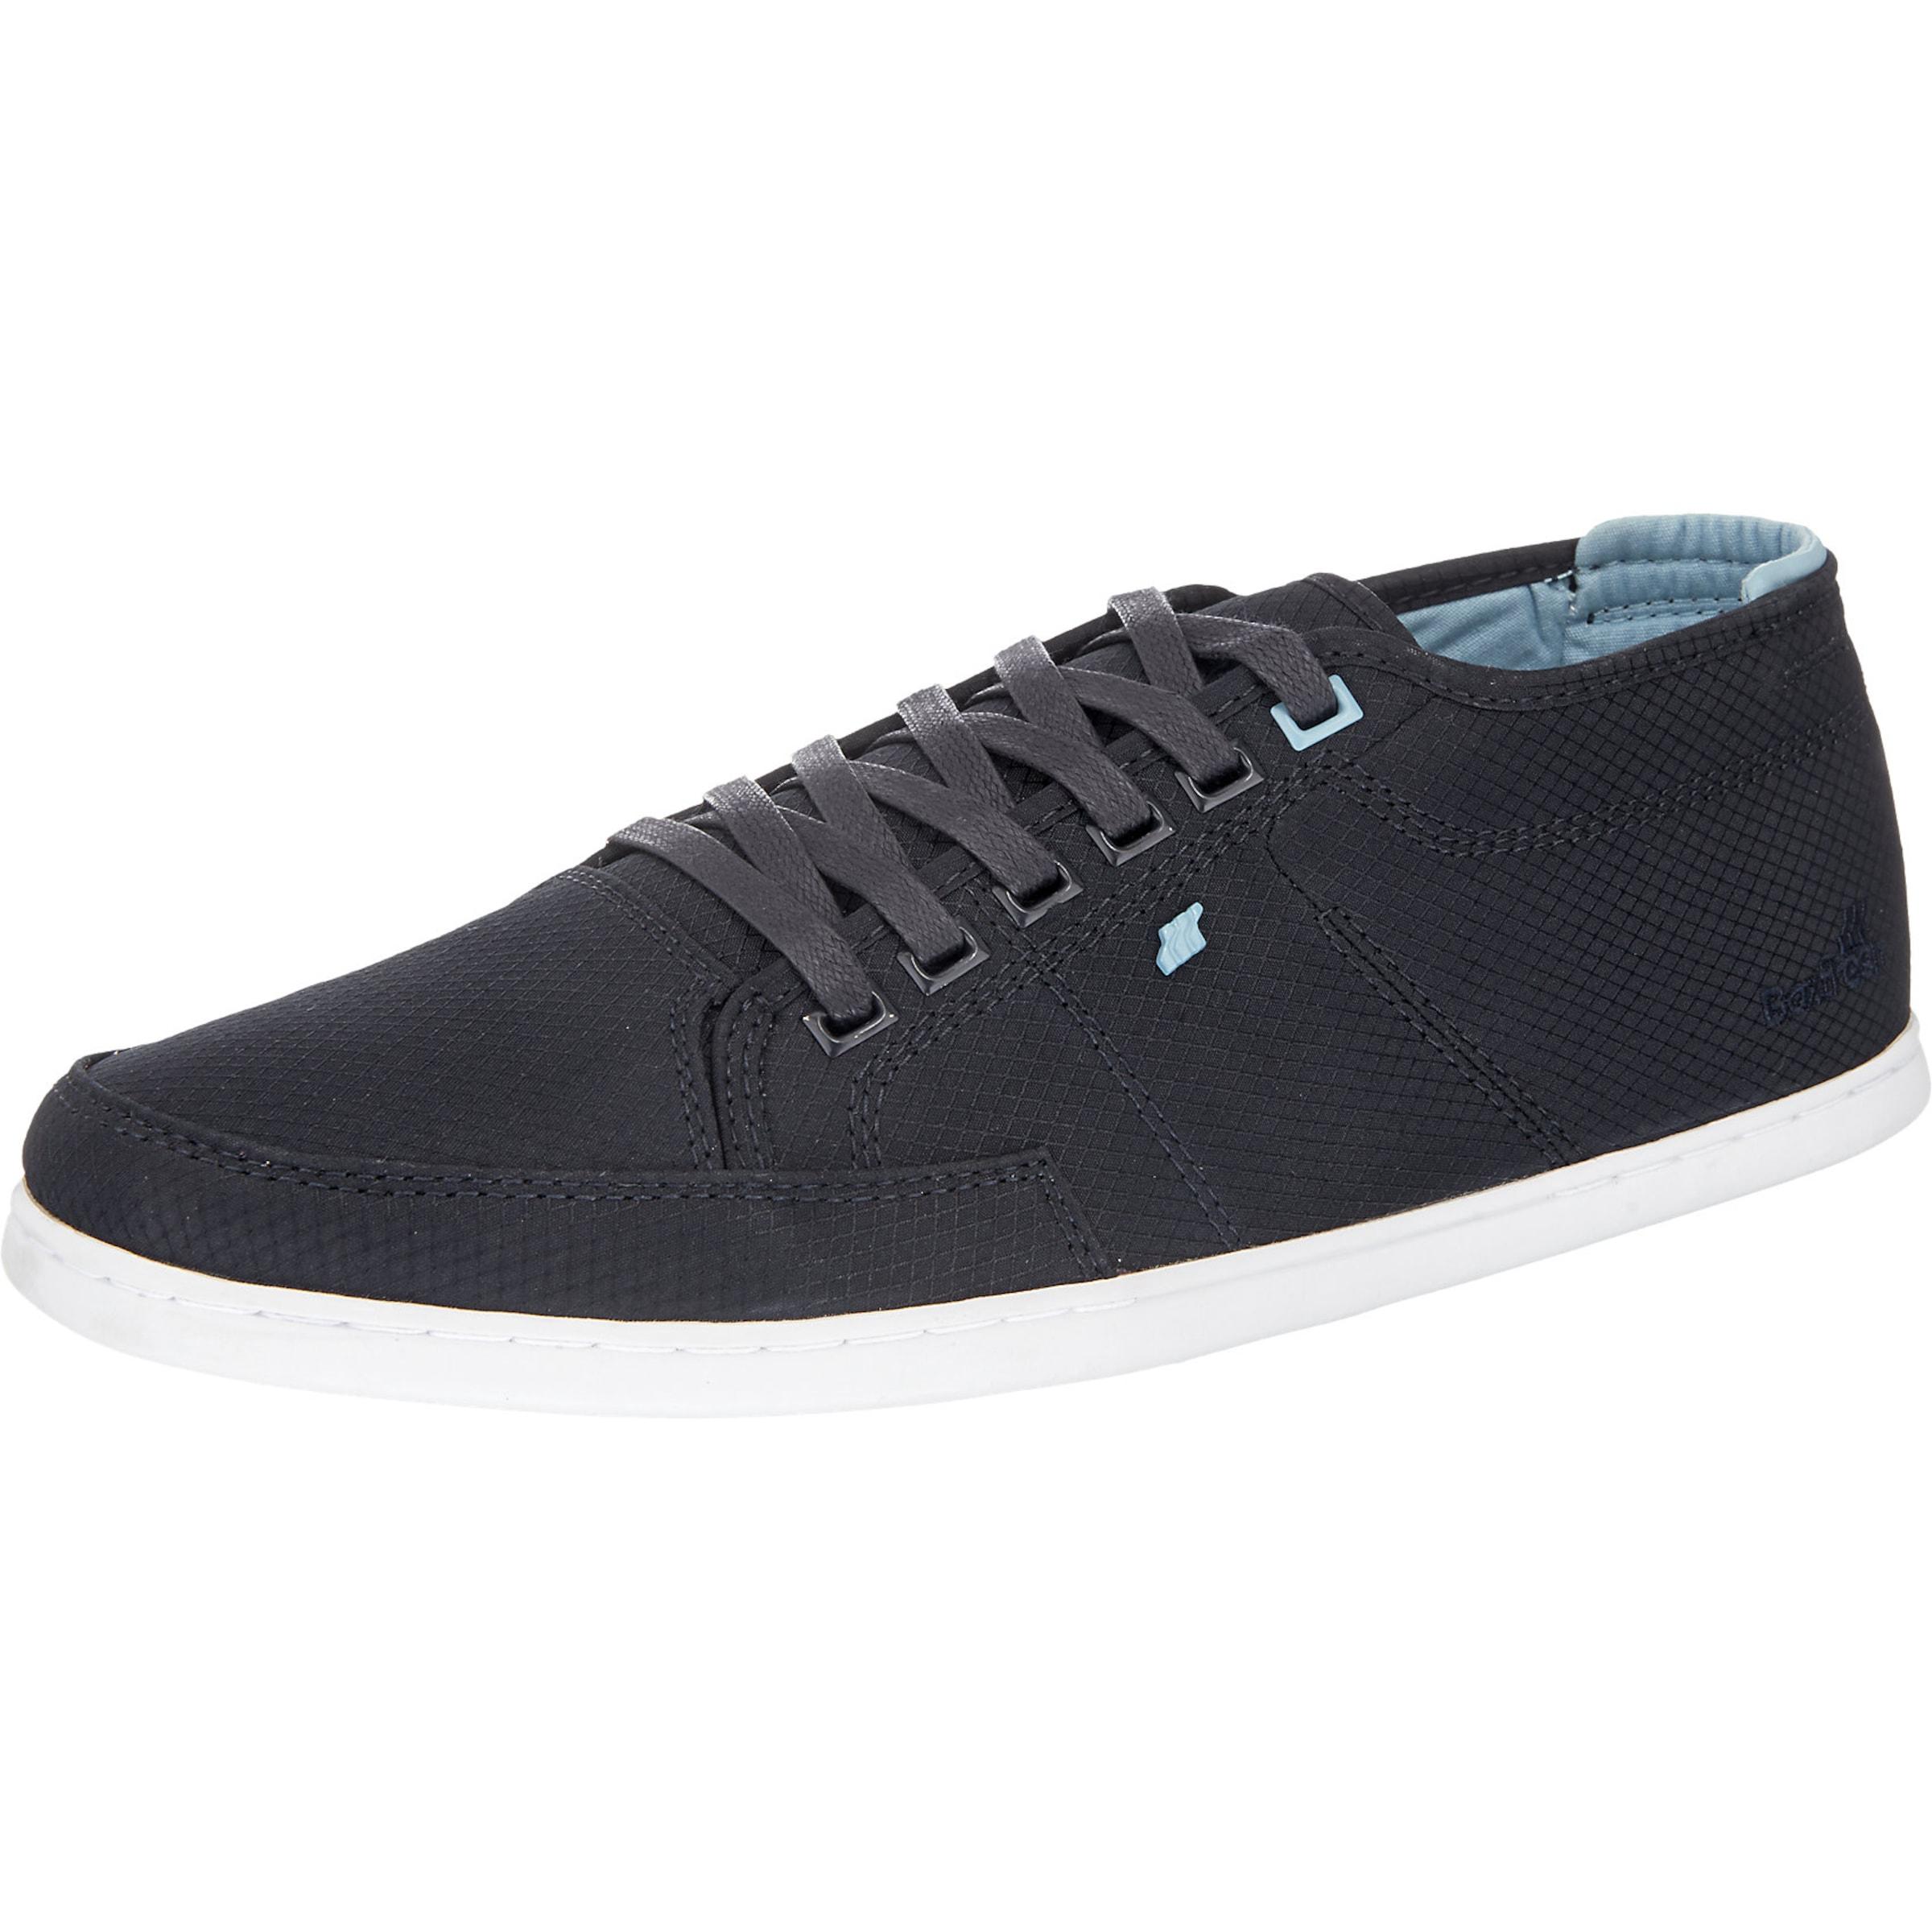 Sneakers 'sparko' Boxfresh Nachtblau In wnO80kP